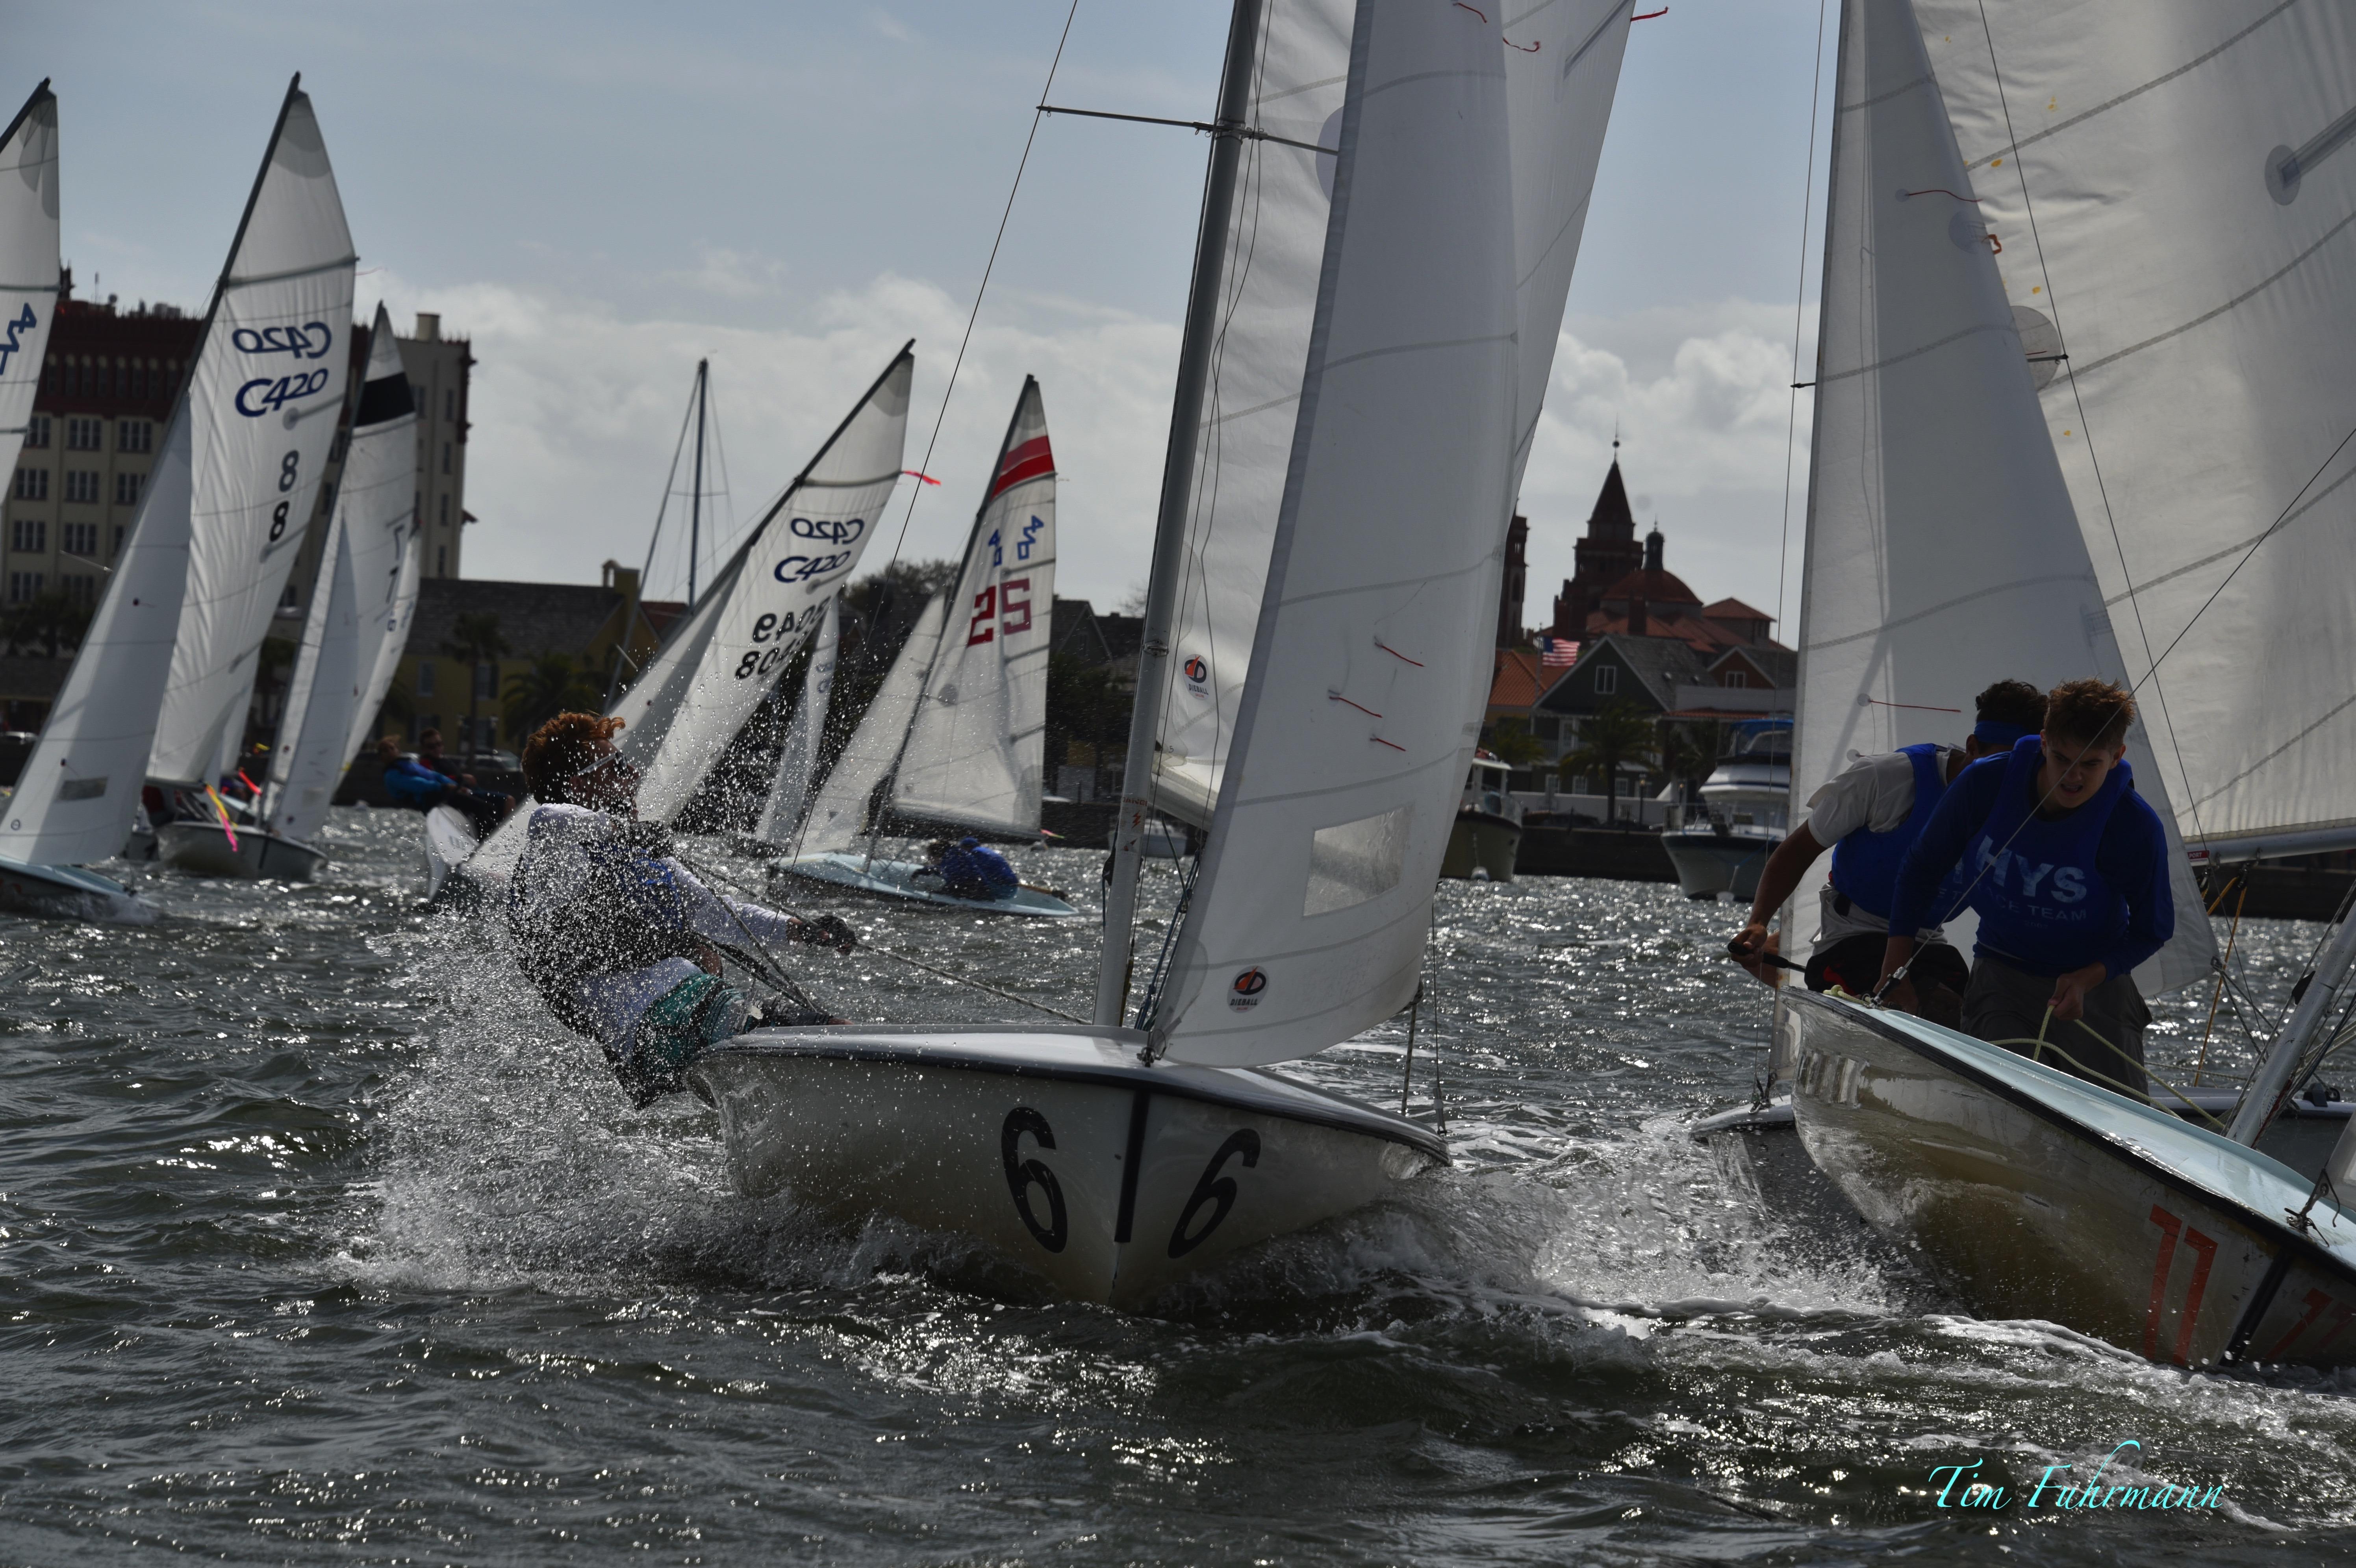 St. Augstine Boat Race 2